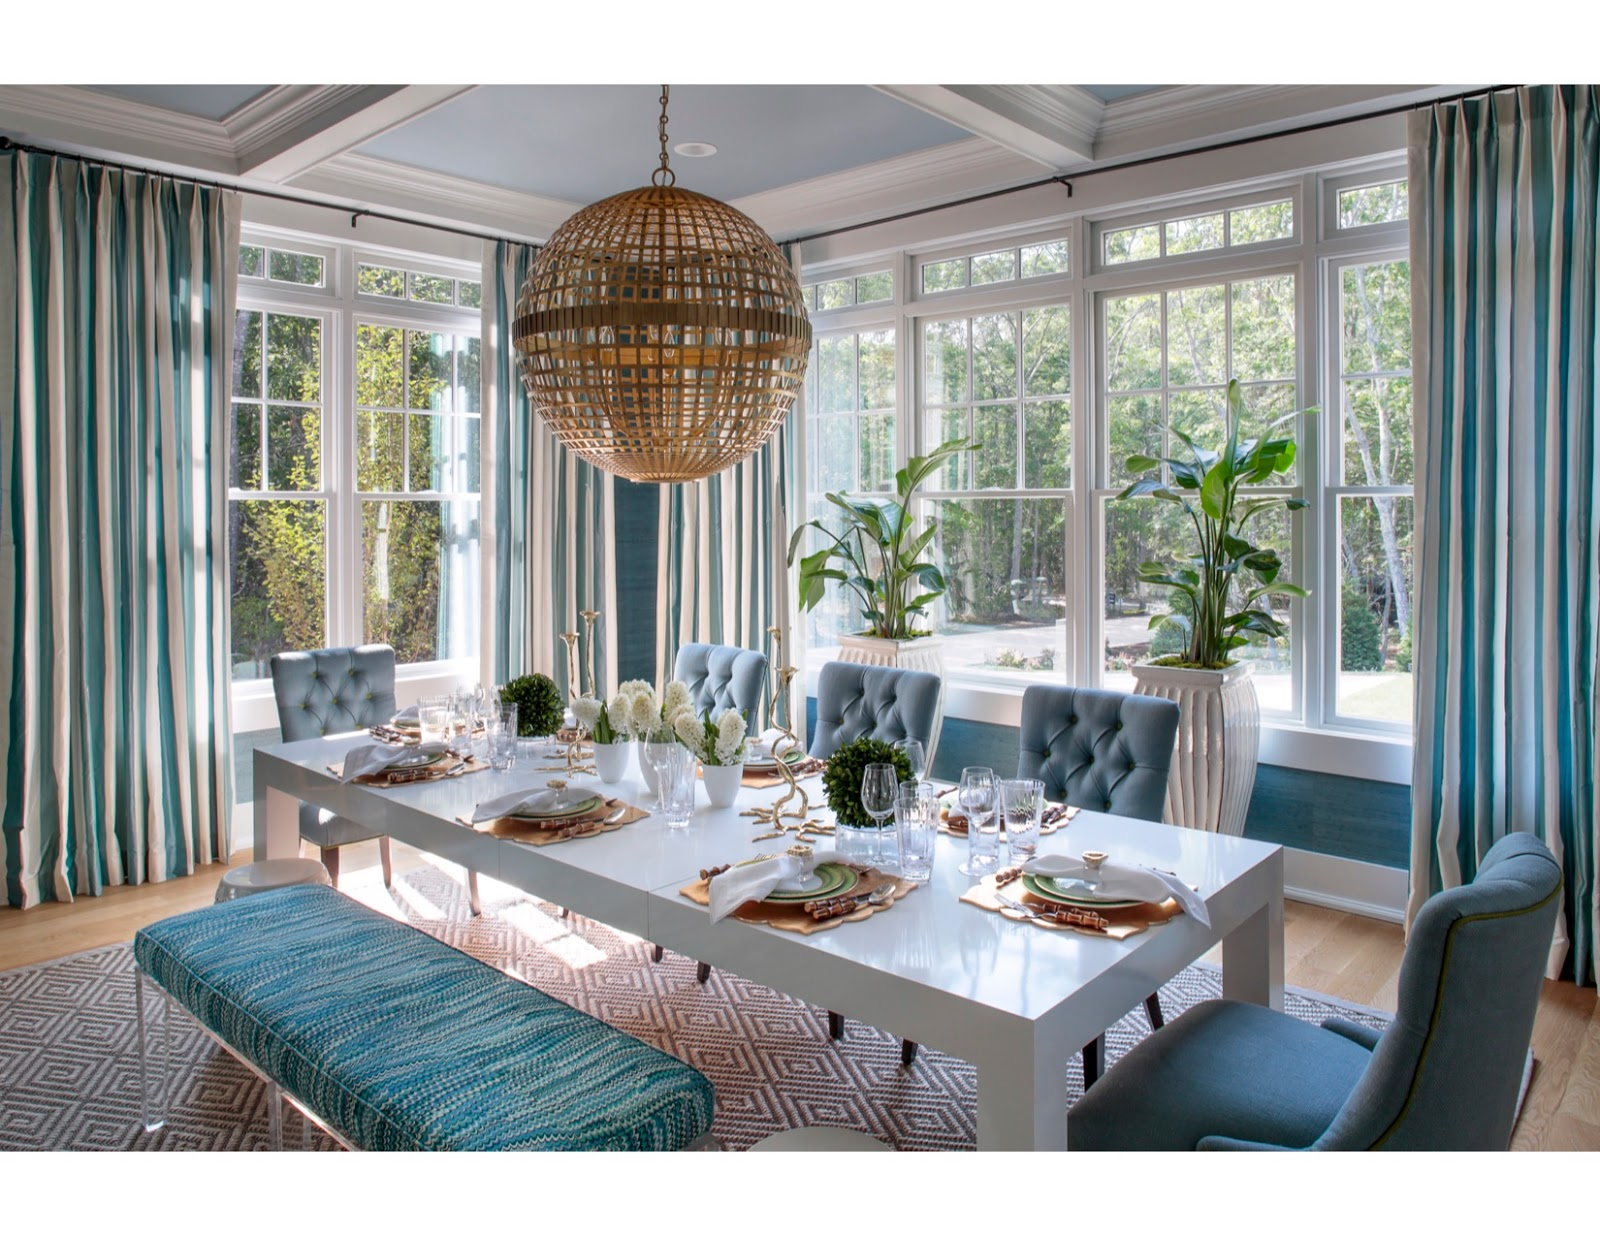 hampton hostess: HAMPTON DESIGNER SHOWHOUSE DIARY on hampton designer bedrooms, hampton home, hampton design,